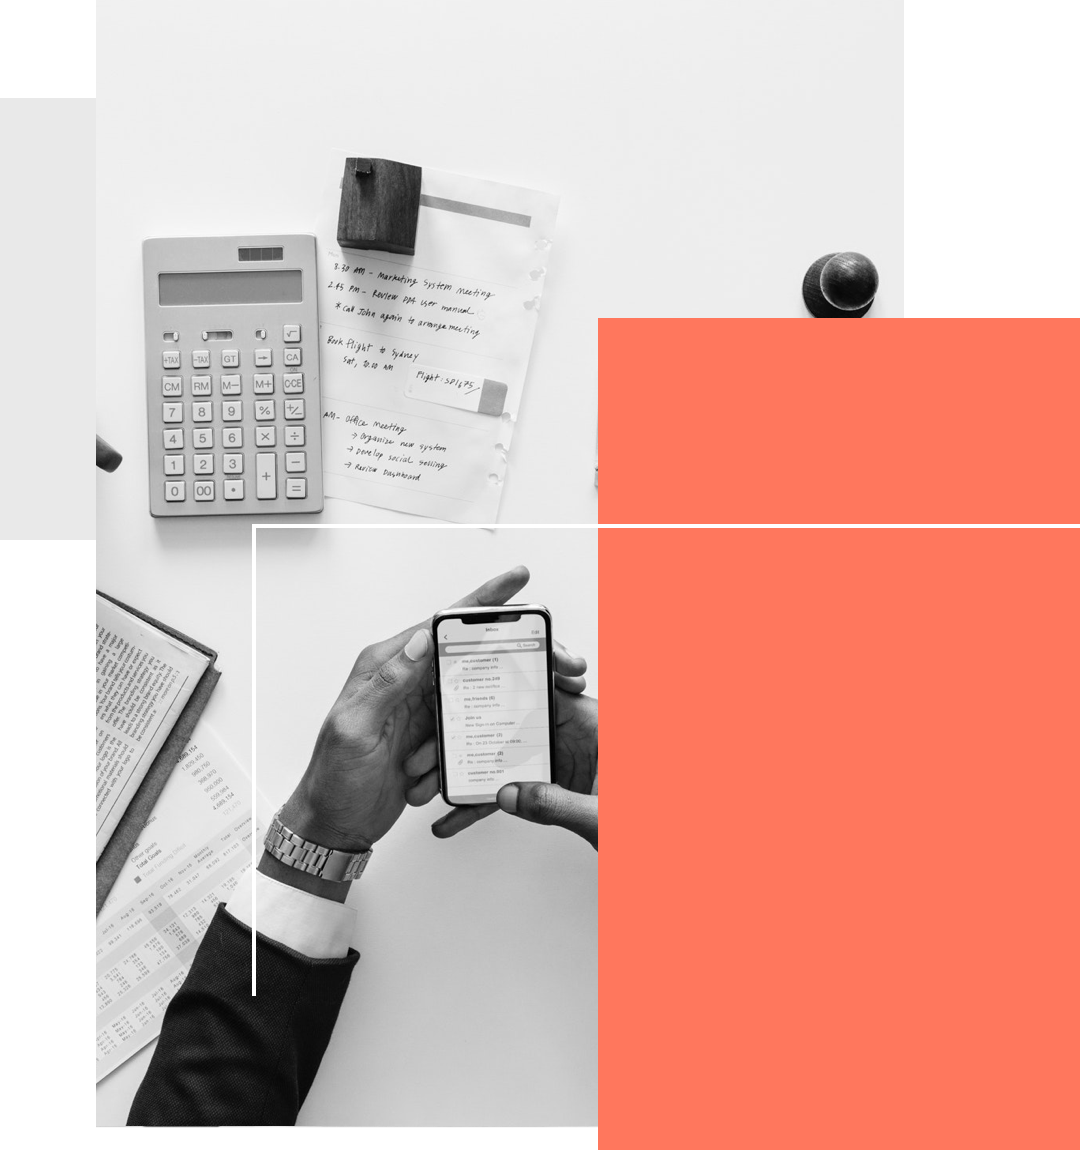 The best survey tool for Agencies- SurveySparrow